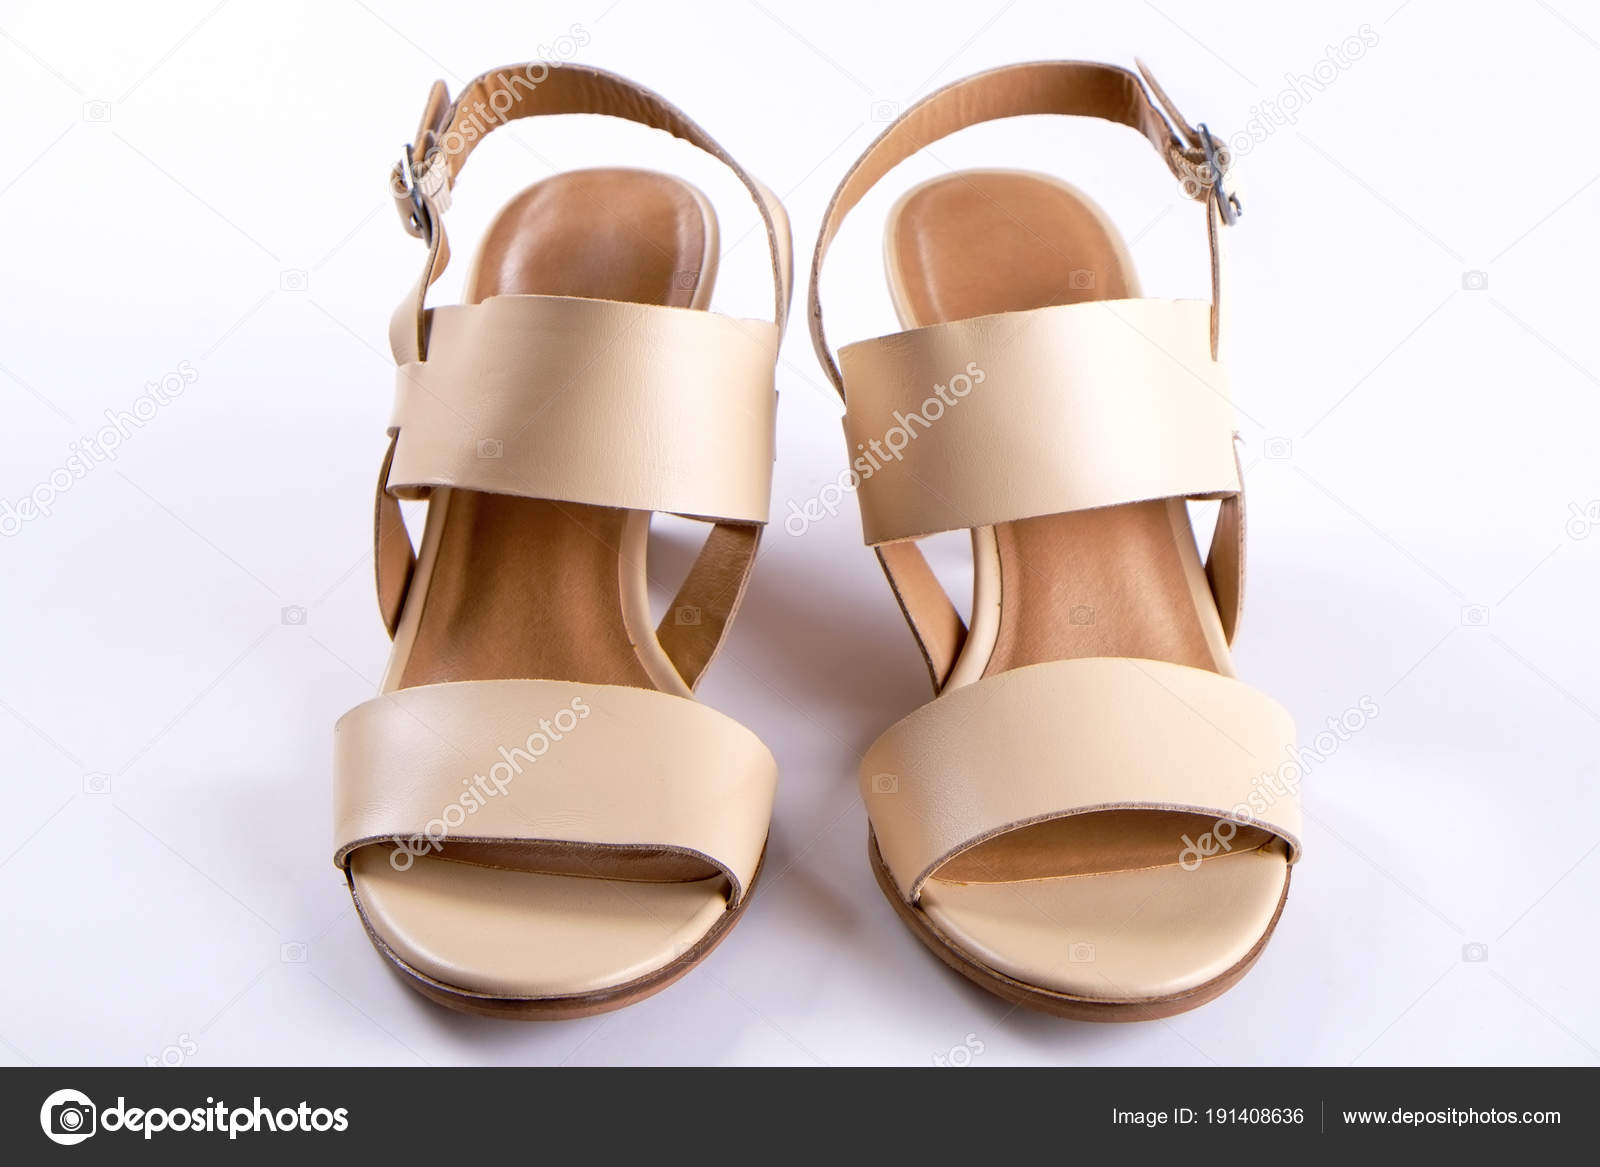 86fb525e507 Κάτοψη της μόδας θηλυκό μεσαίου ψηλοτάκουνα δερμάτινα παπούτσια των ...